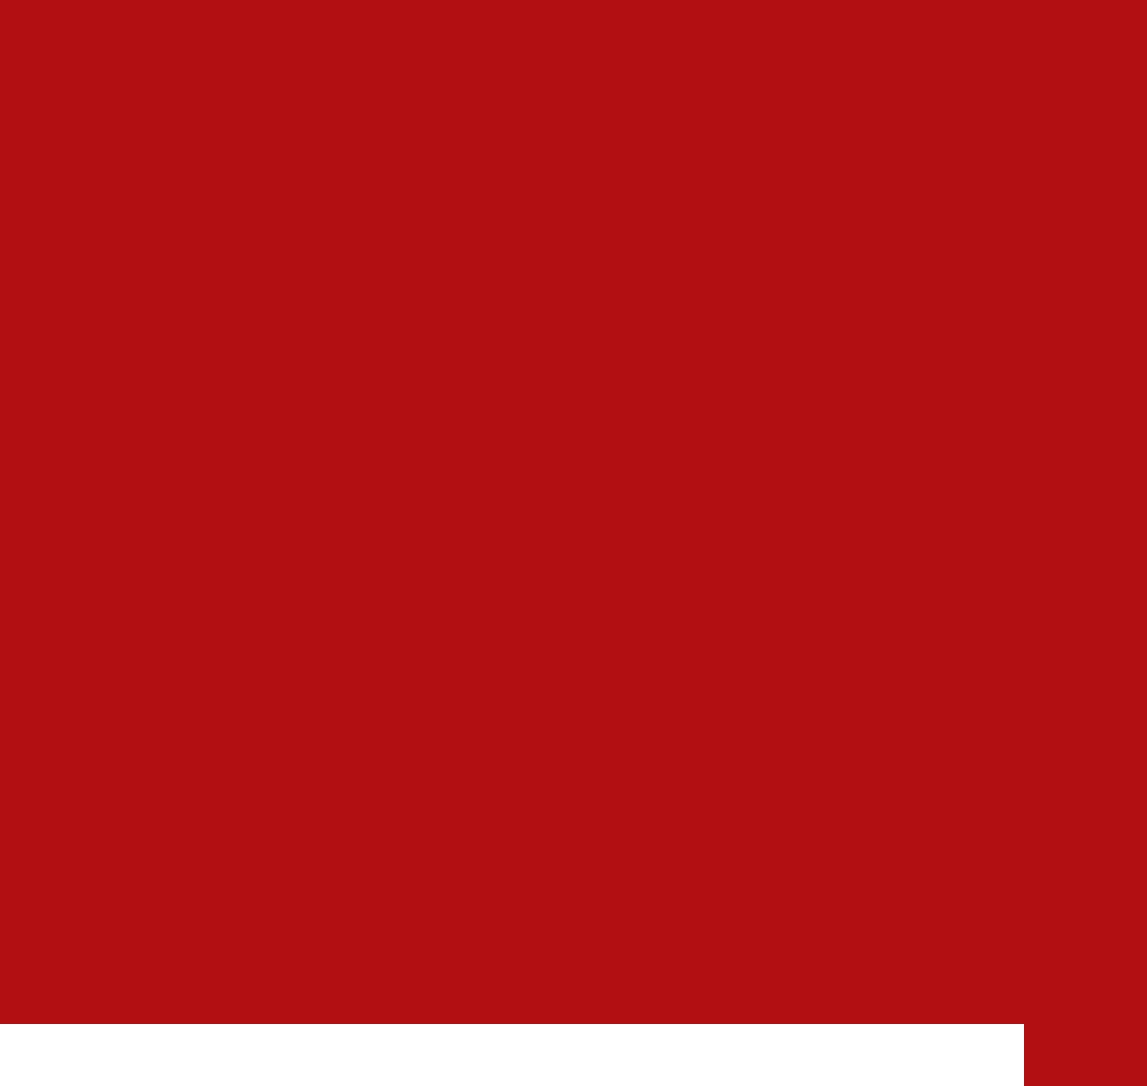 background_text-bild_2-3-v2-left_red